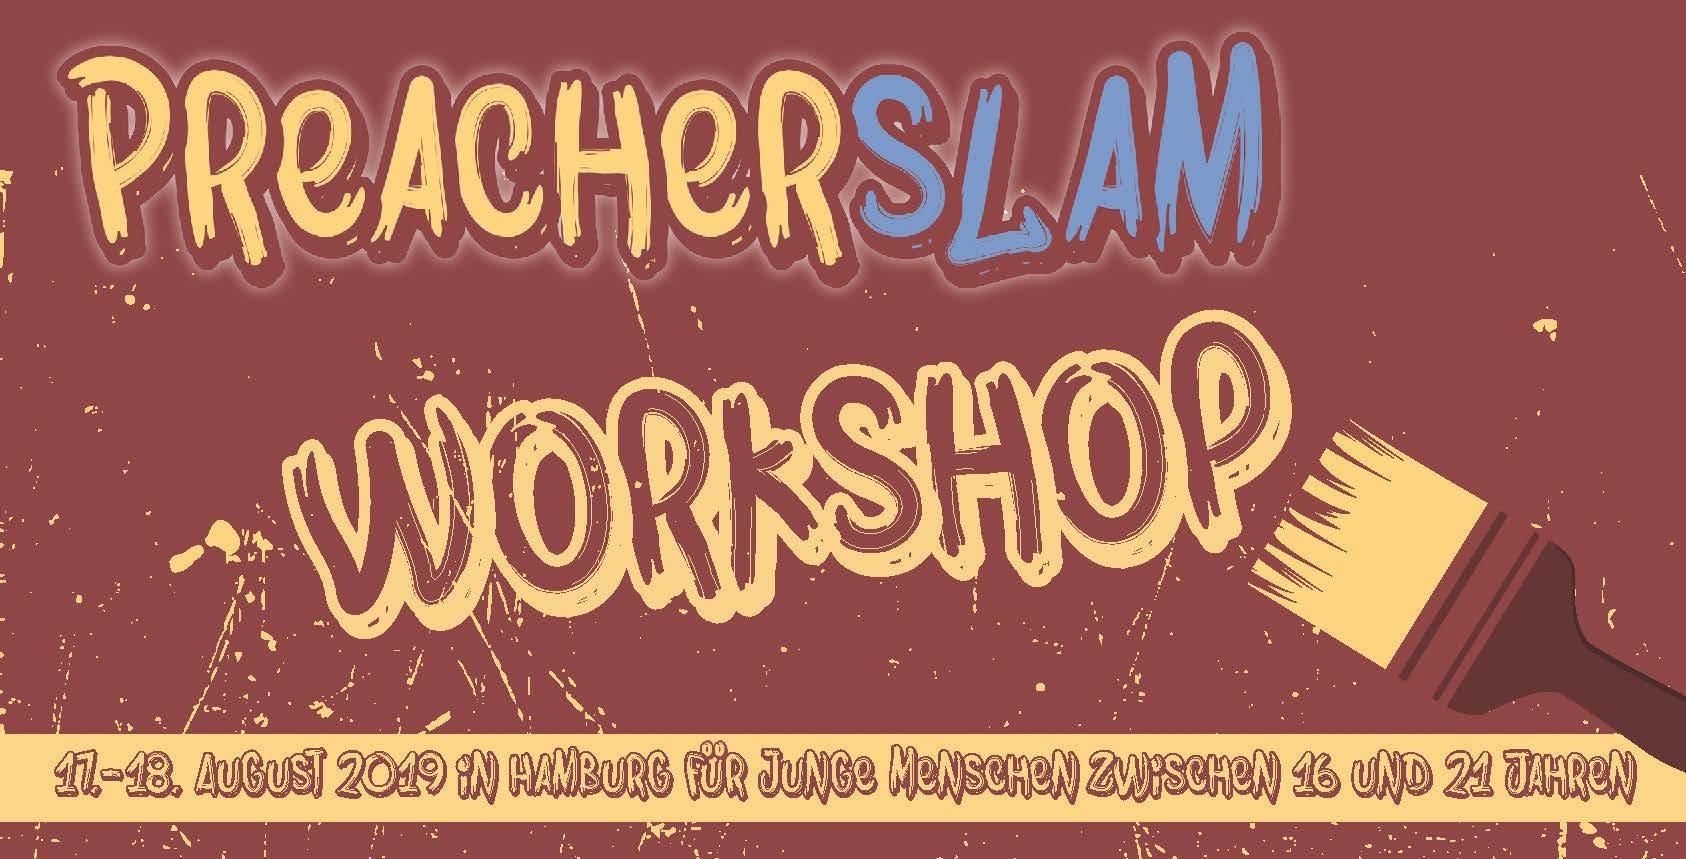 Preacherslam Workshop